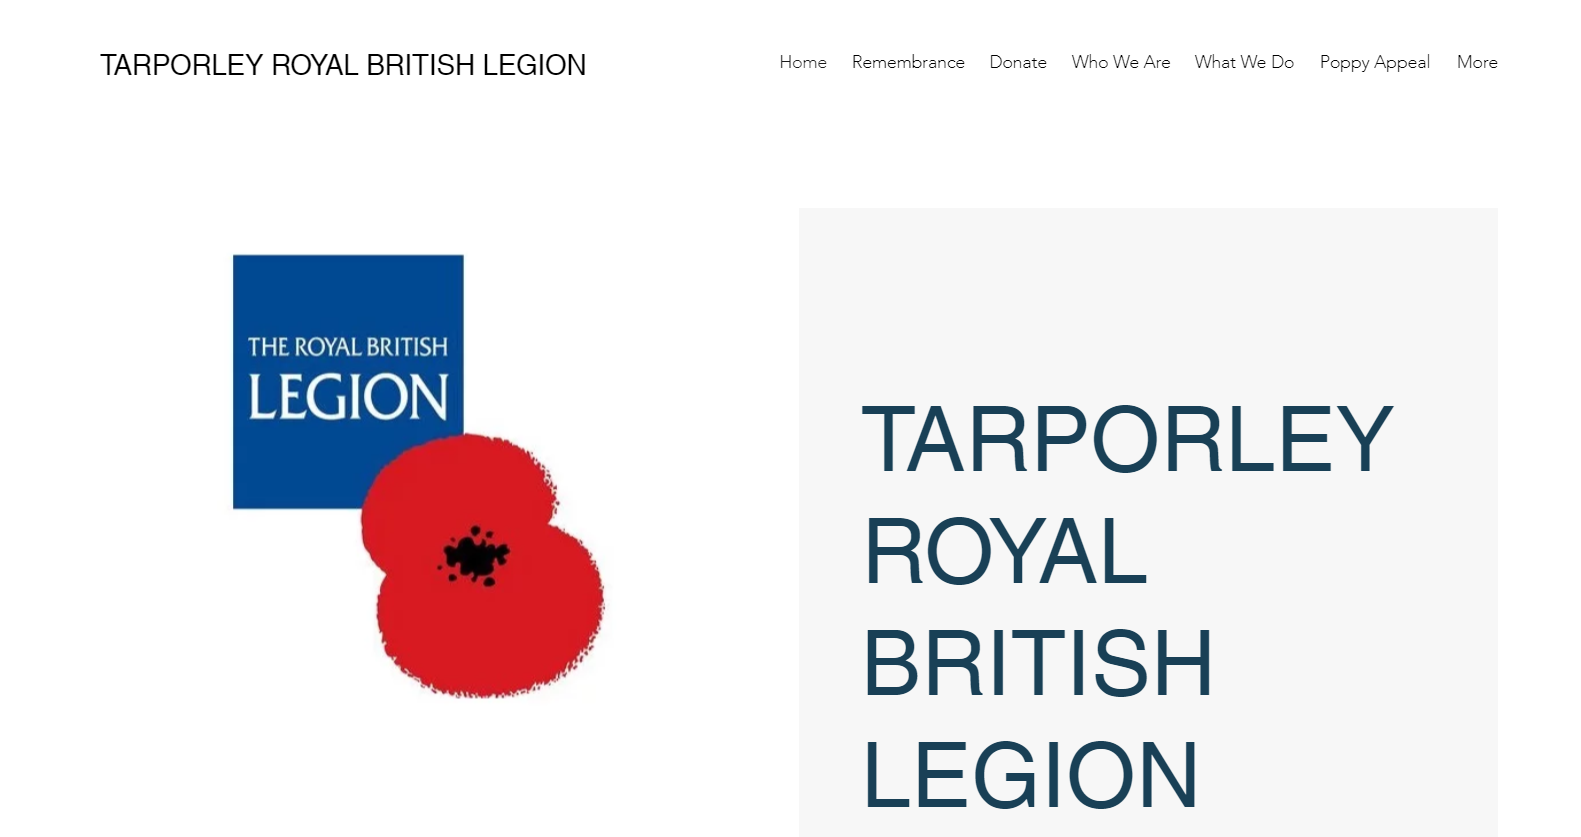 Tarporley RBL Home Page